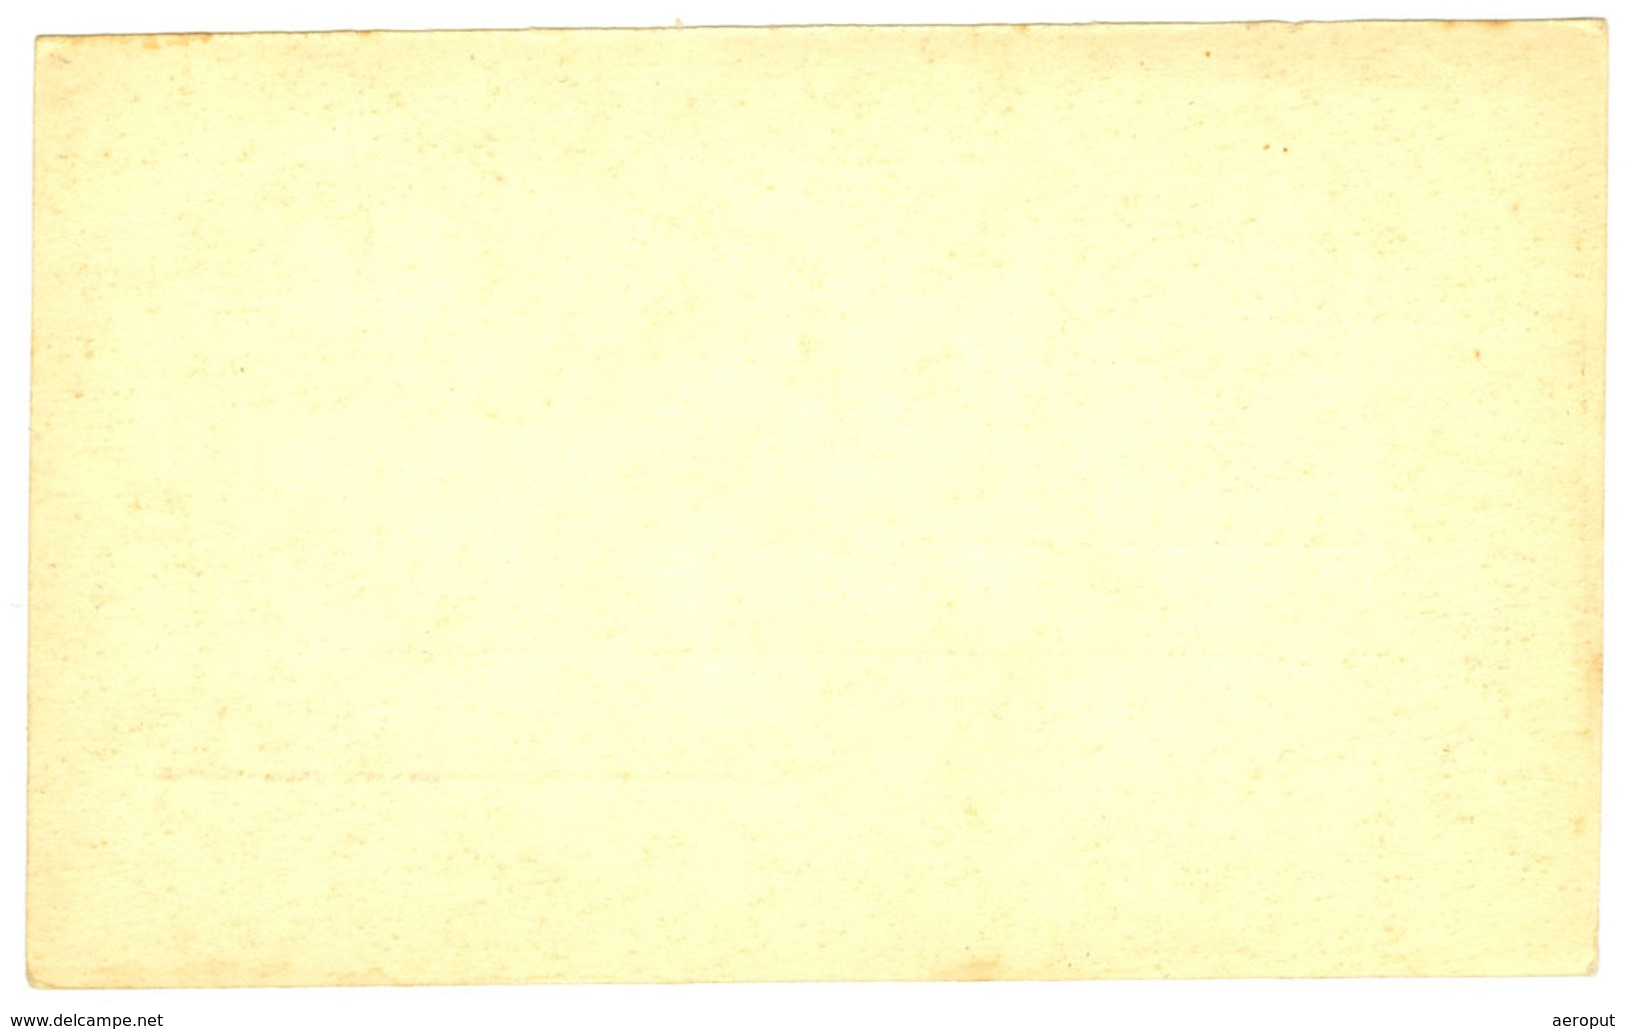 SERBIA Postal Stationery Card - Carte Postale - 5 Para, King Peter I (1911) - Unused #1 - Serbie